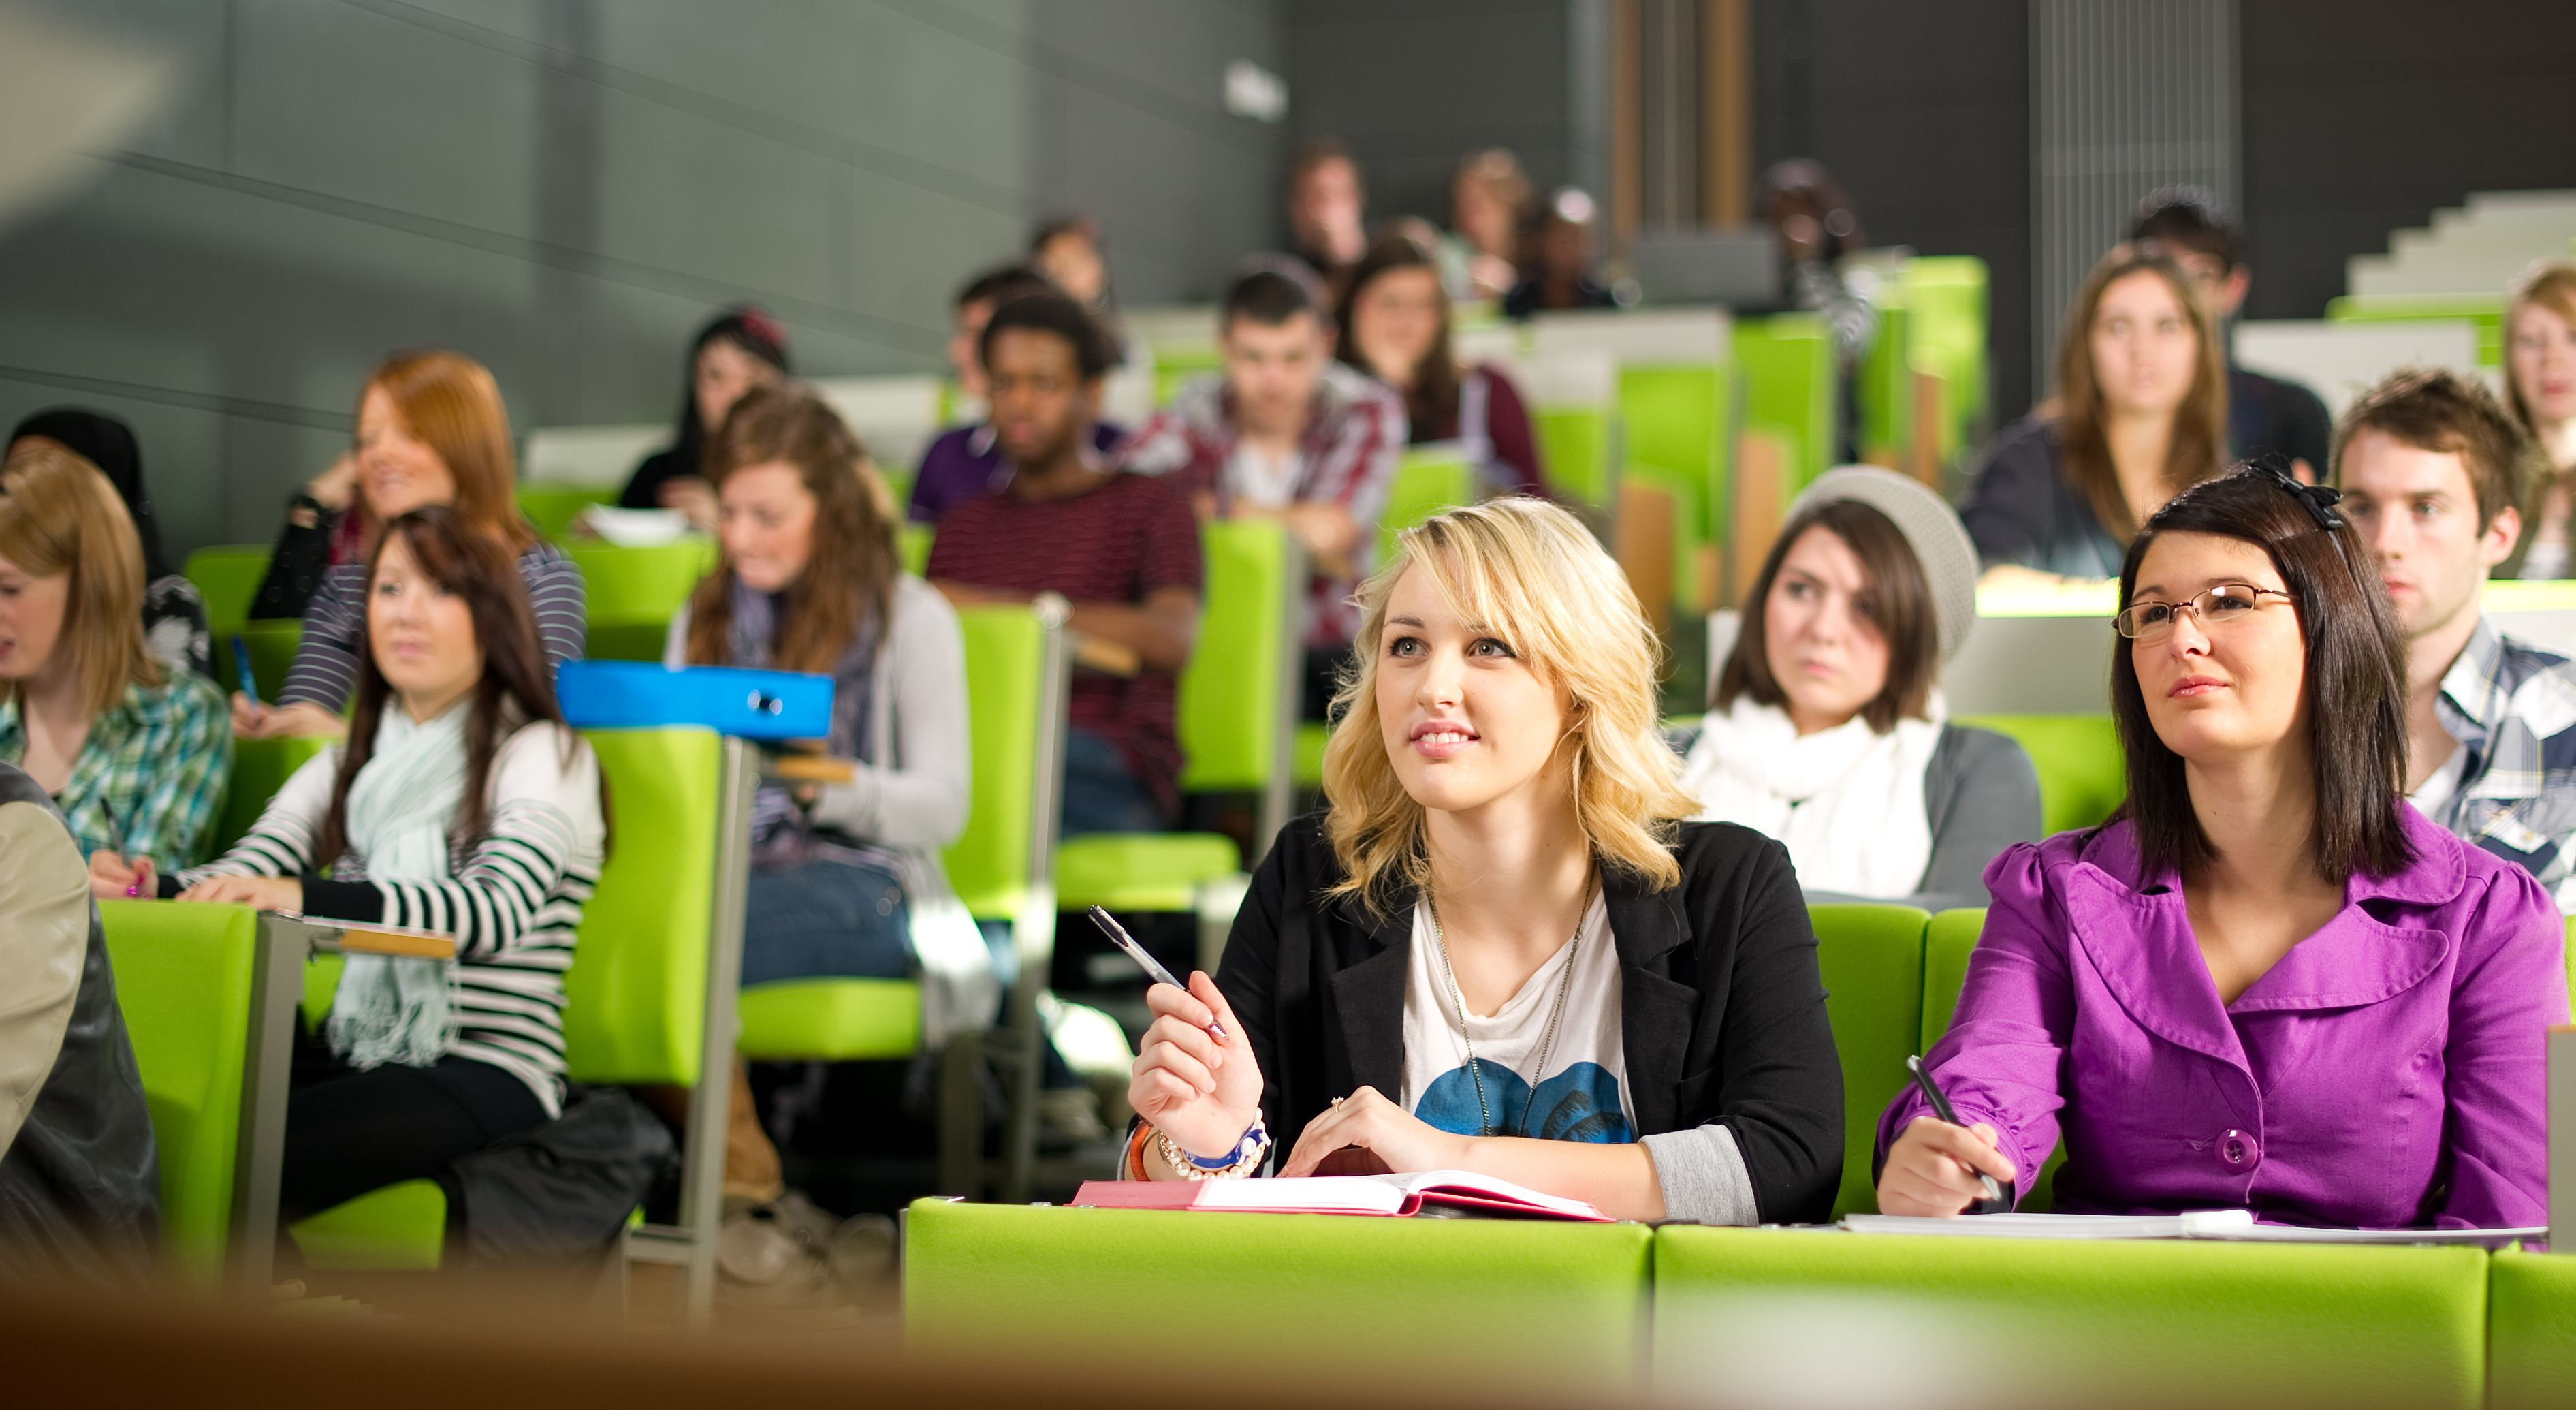 Buyessayclub review online degree jobs